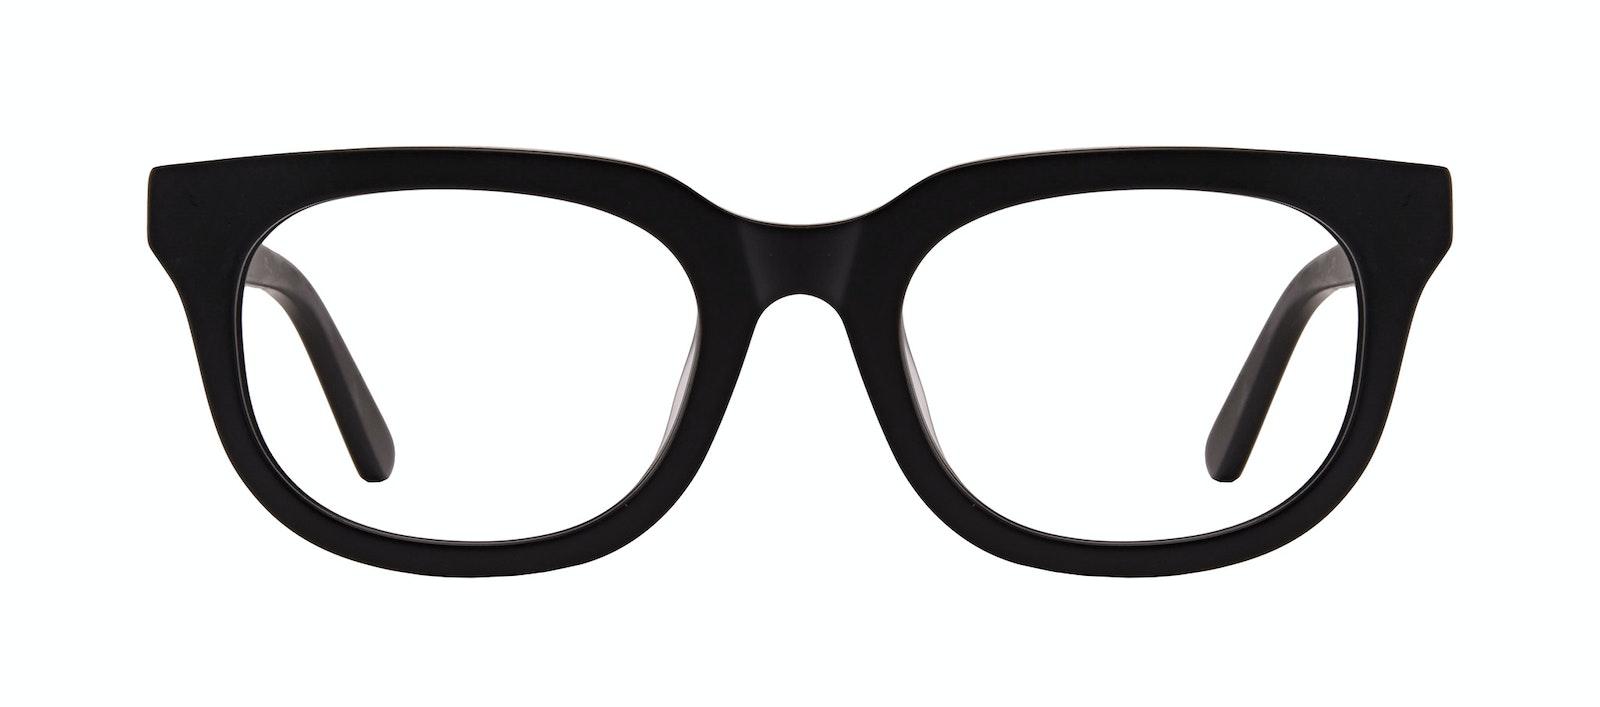 Affordable Fashion Glasses Square Eyeglasses Men Stout Matte Black Front